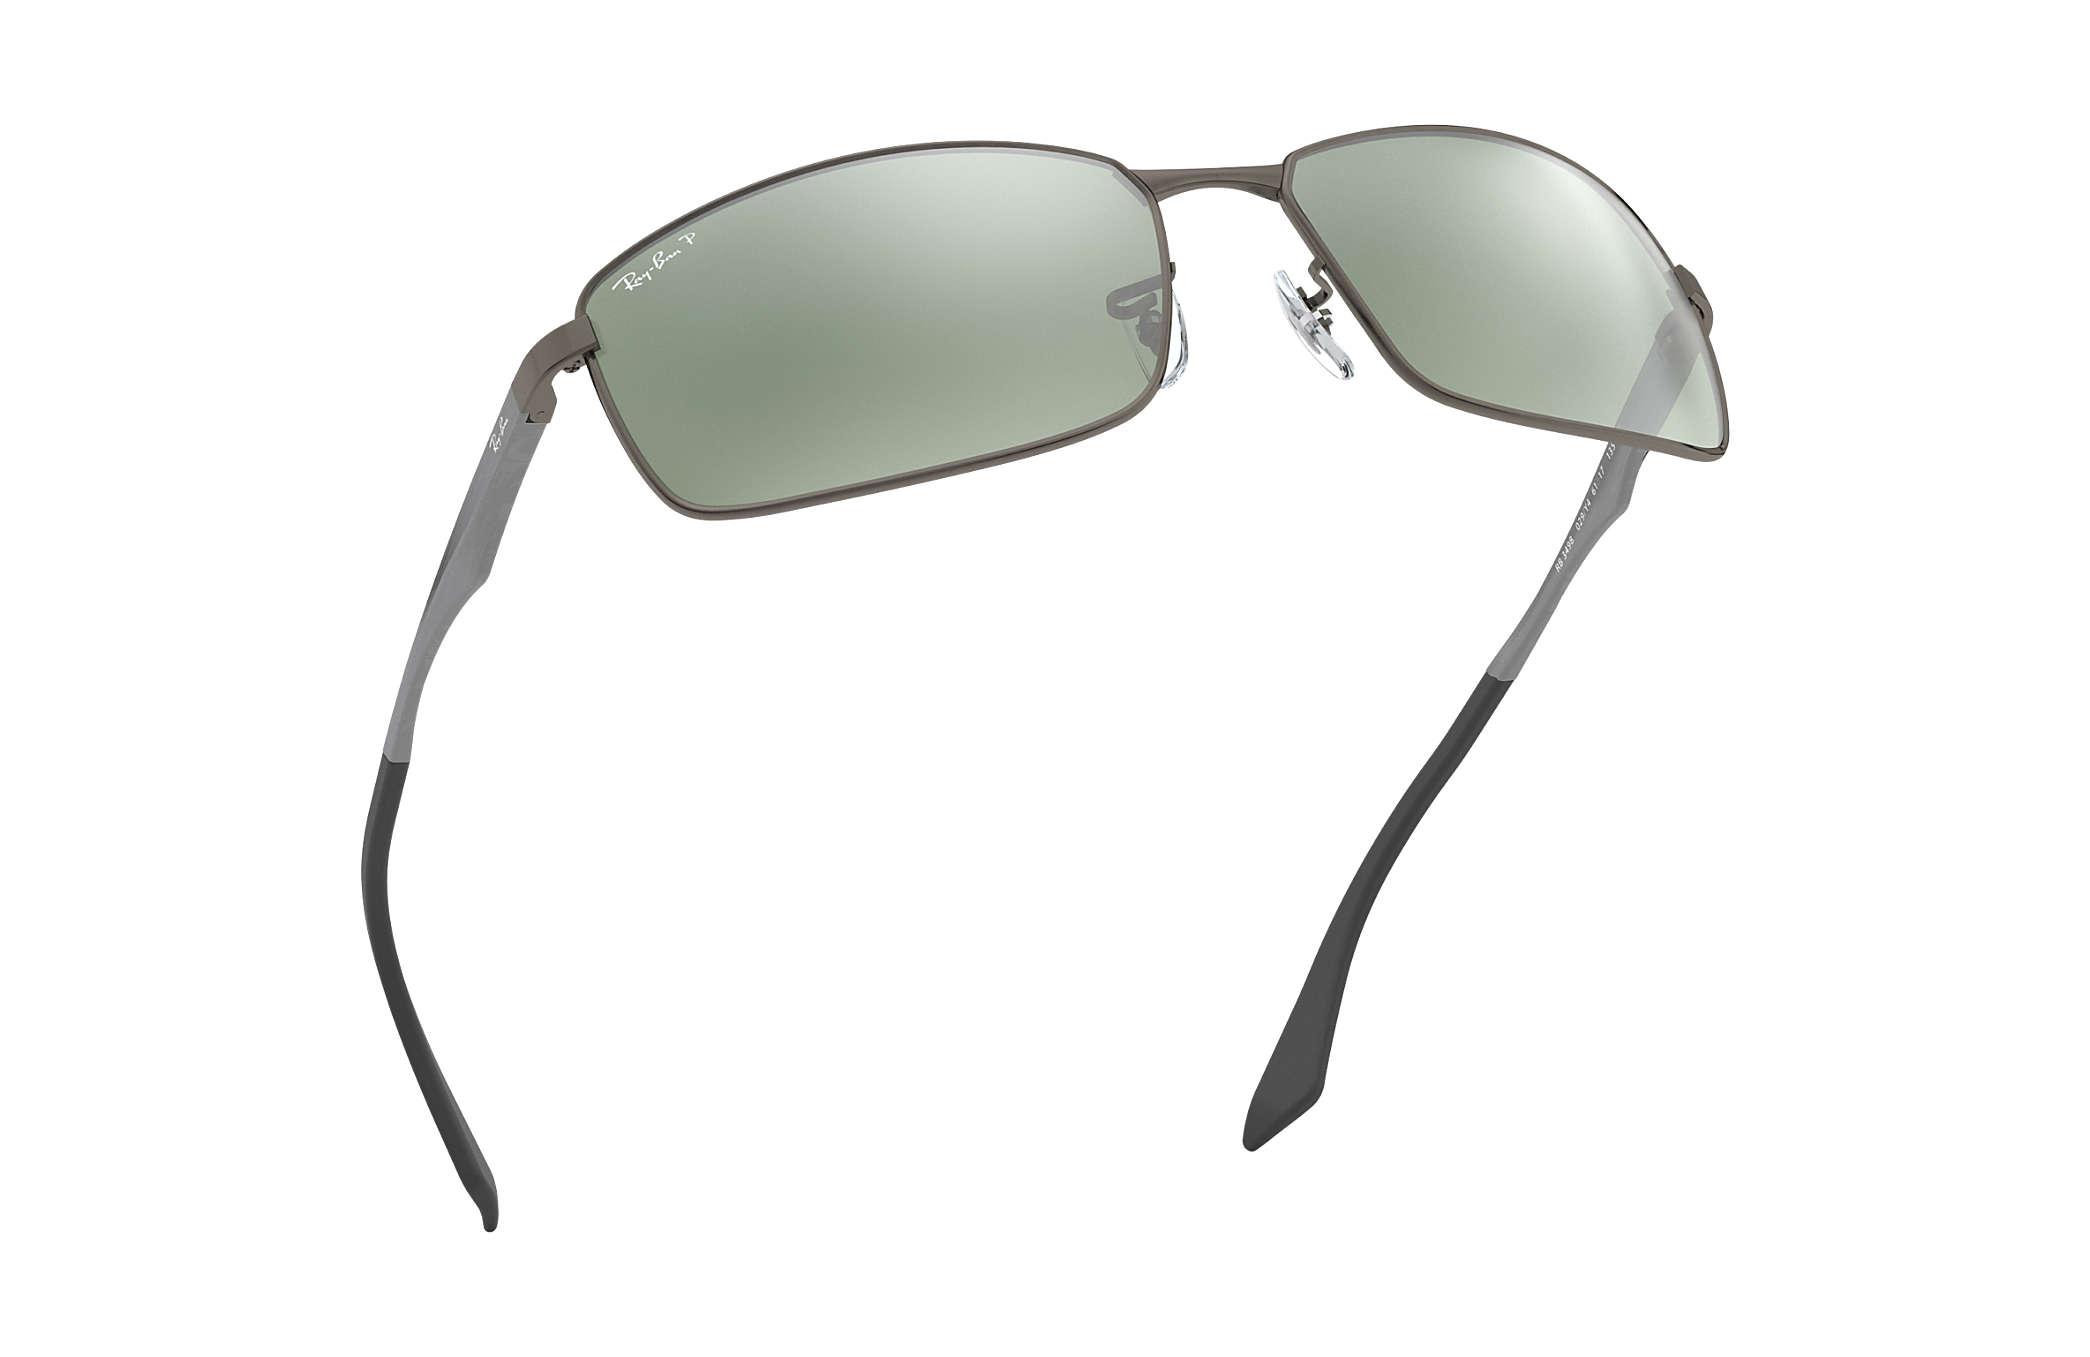 0dfafc6ca Ray Ban Rb3183 Active Lifestyle Black Sunglasses